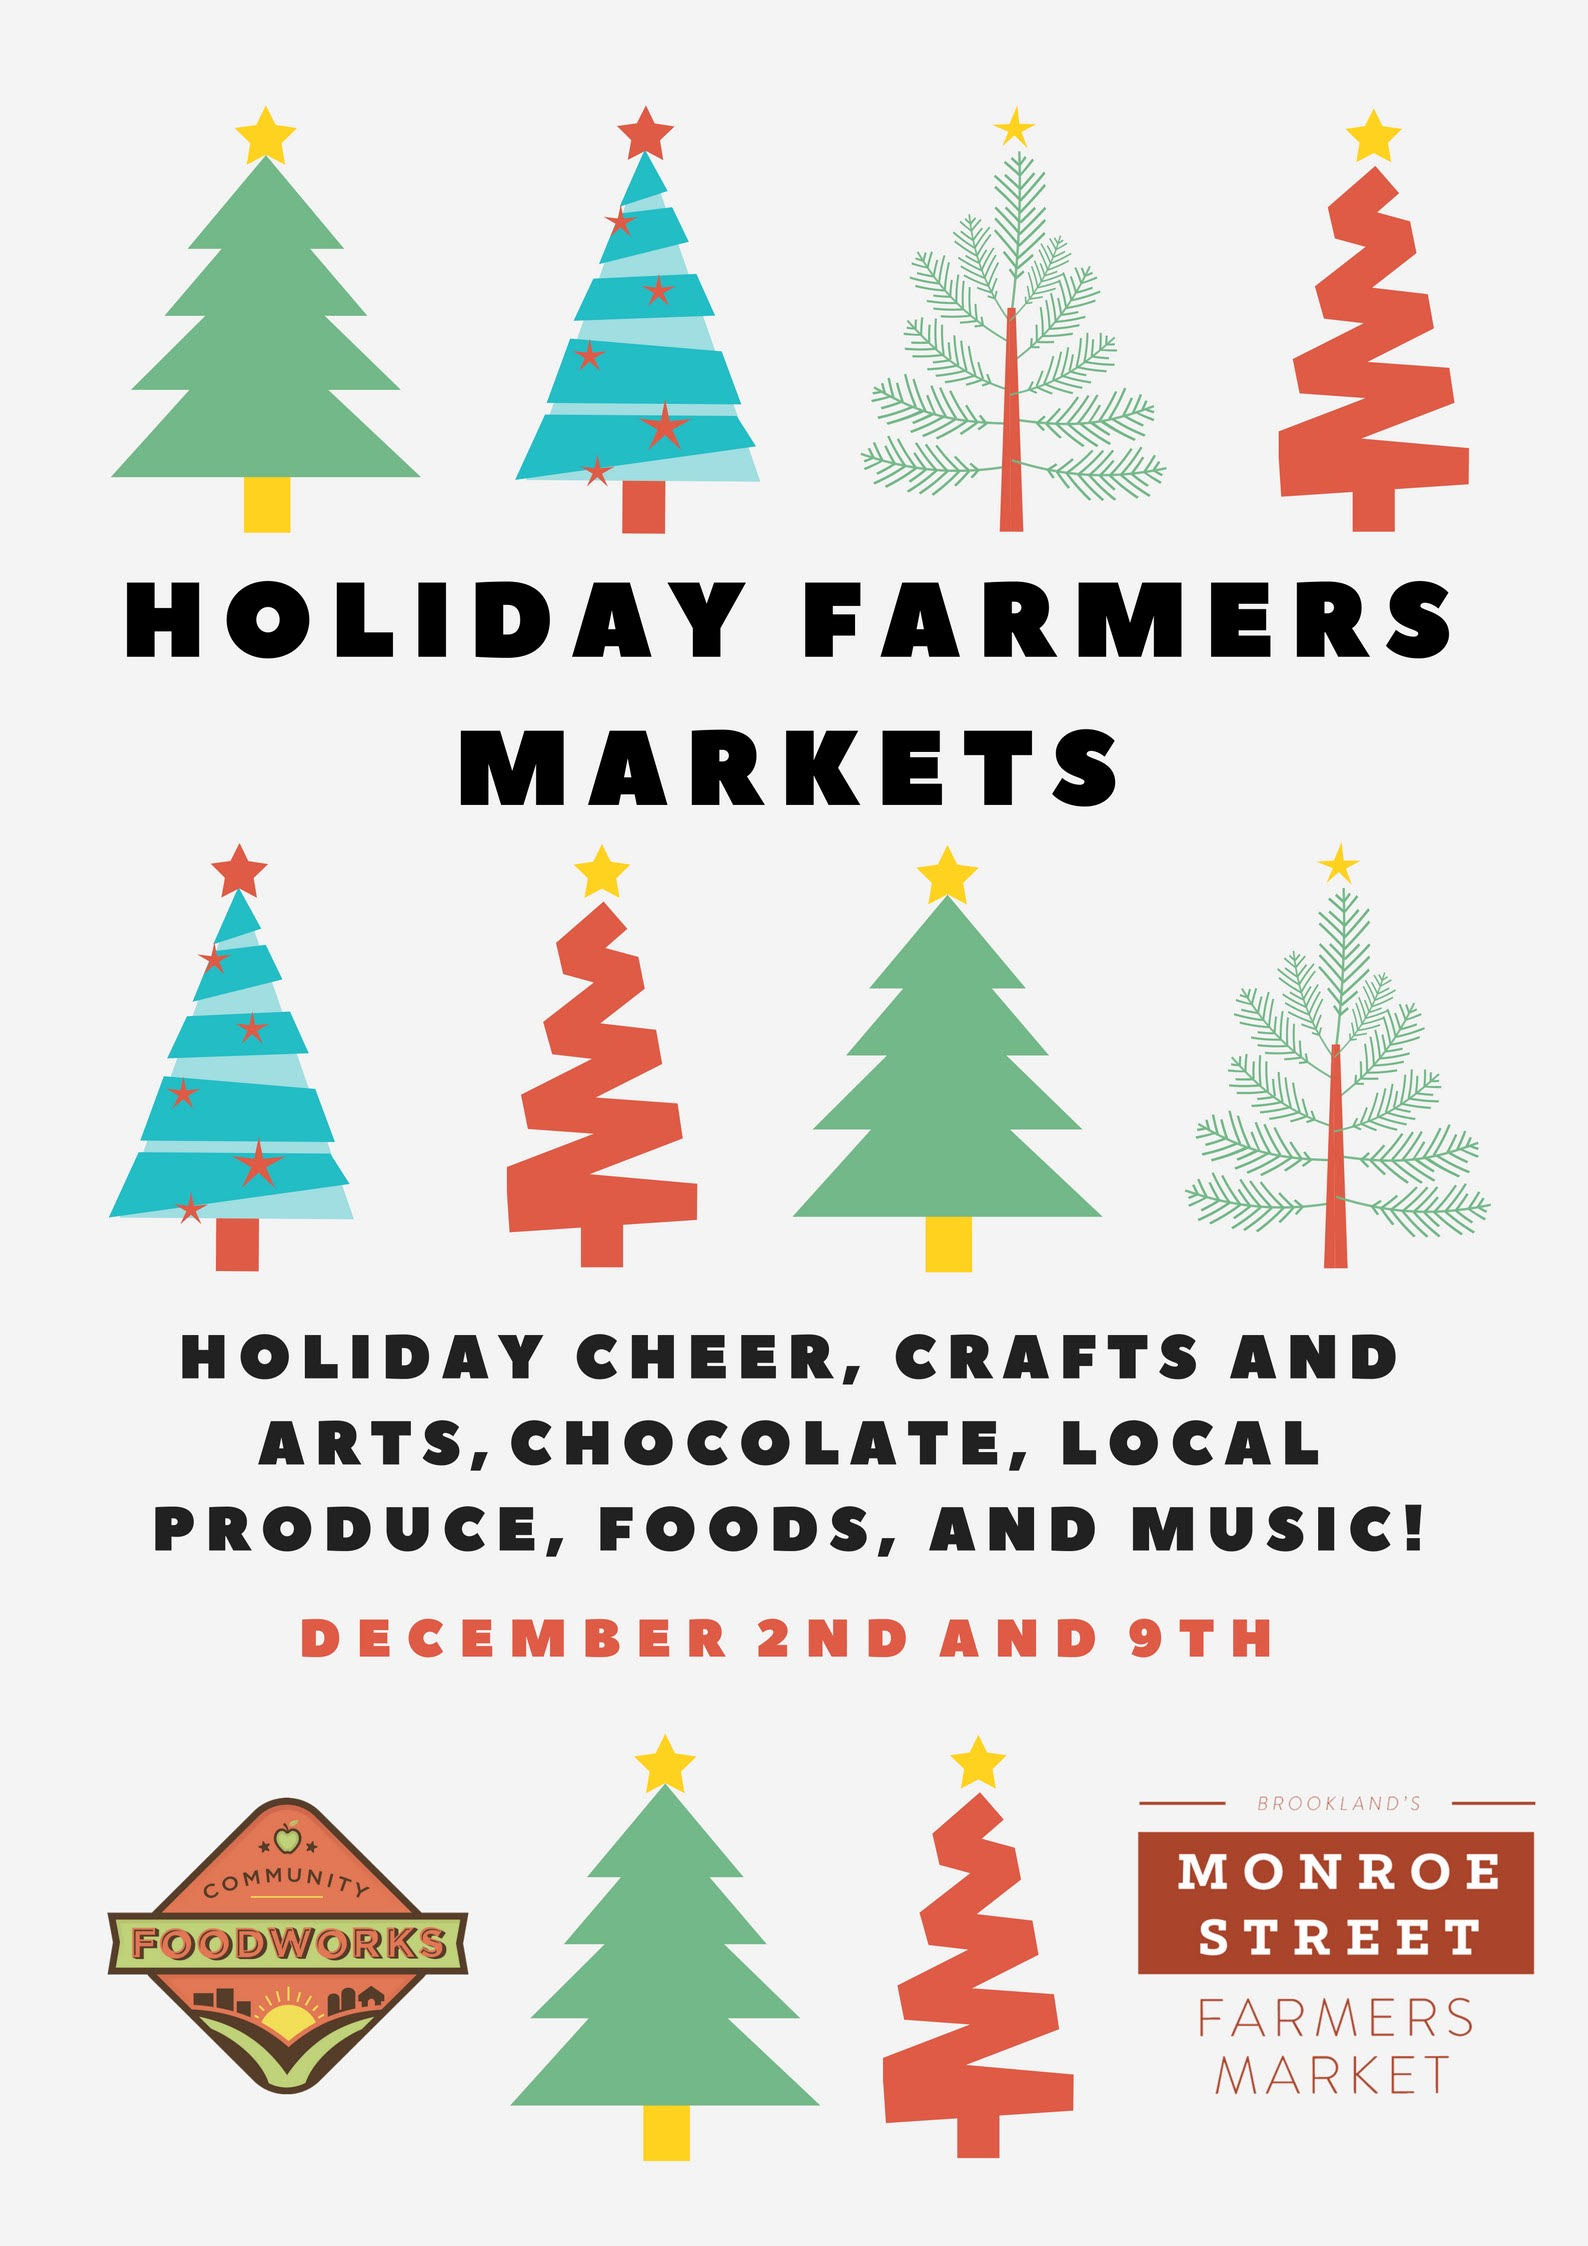 Farmers Market at Monroe Street Market